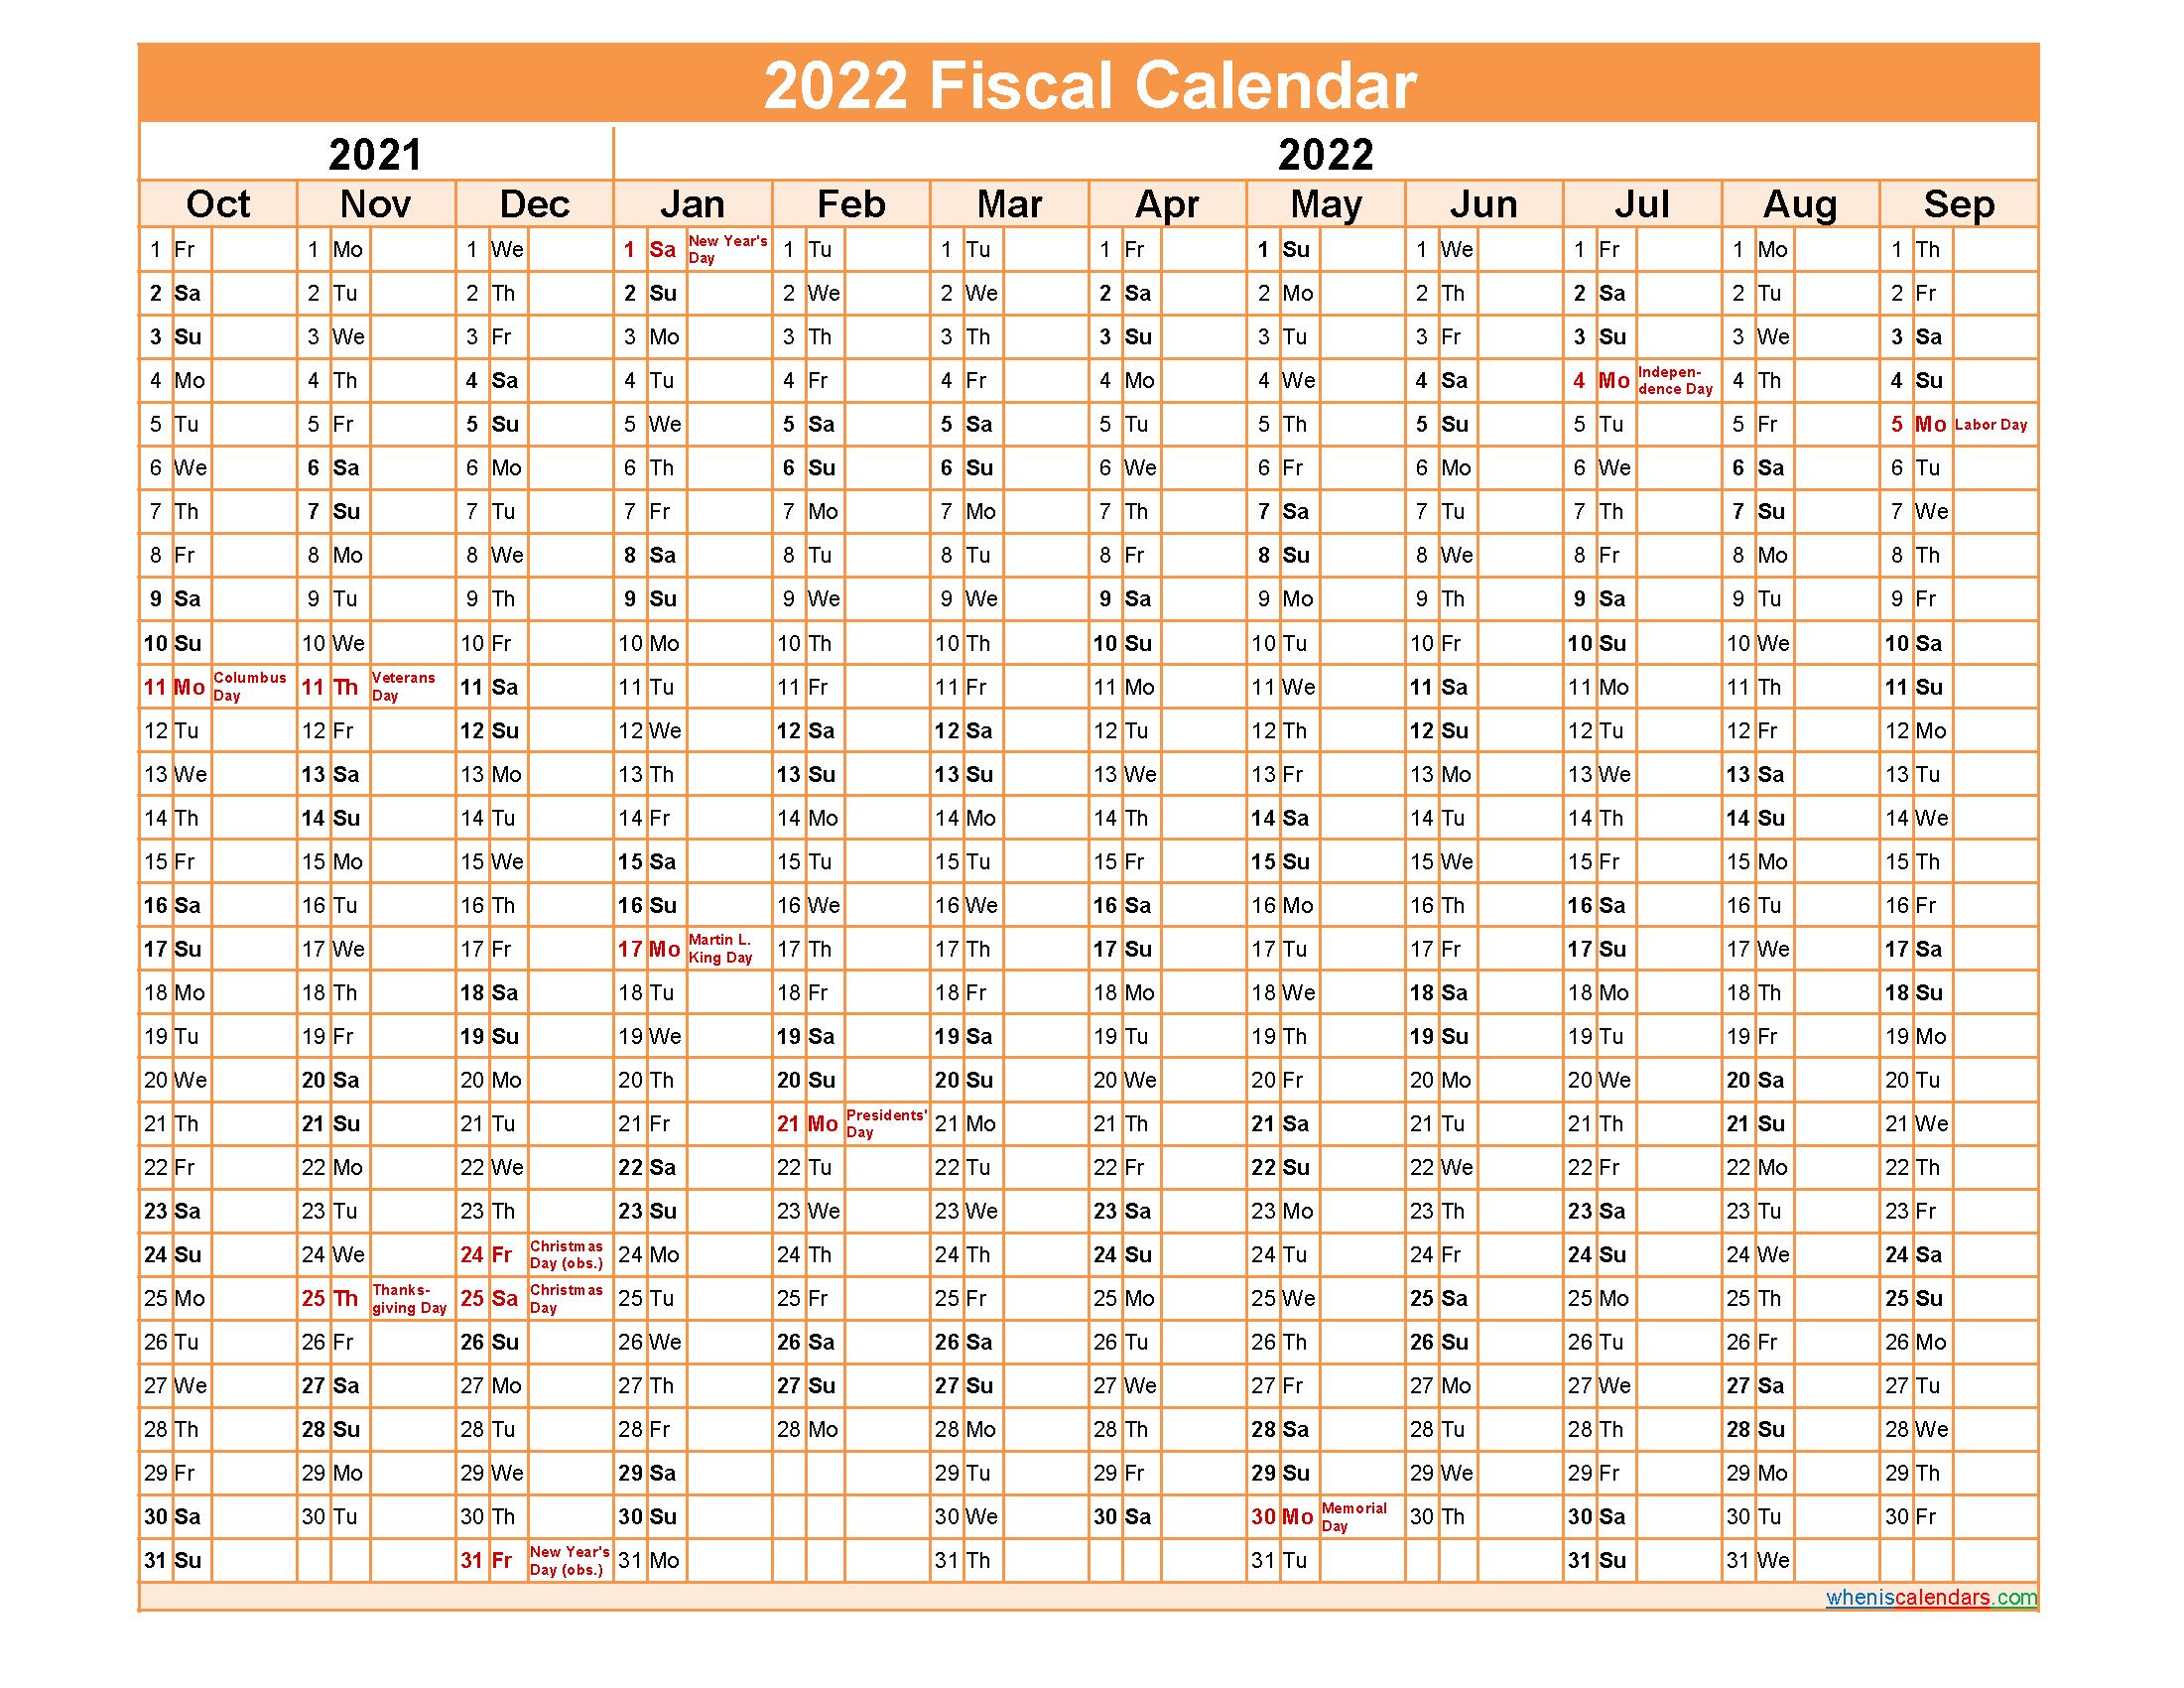 Federal Fiscal Year 2022 Calendar